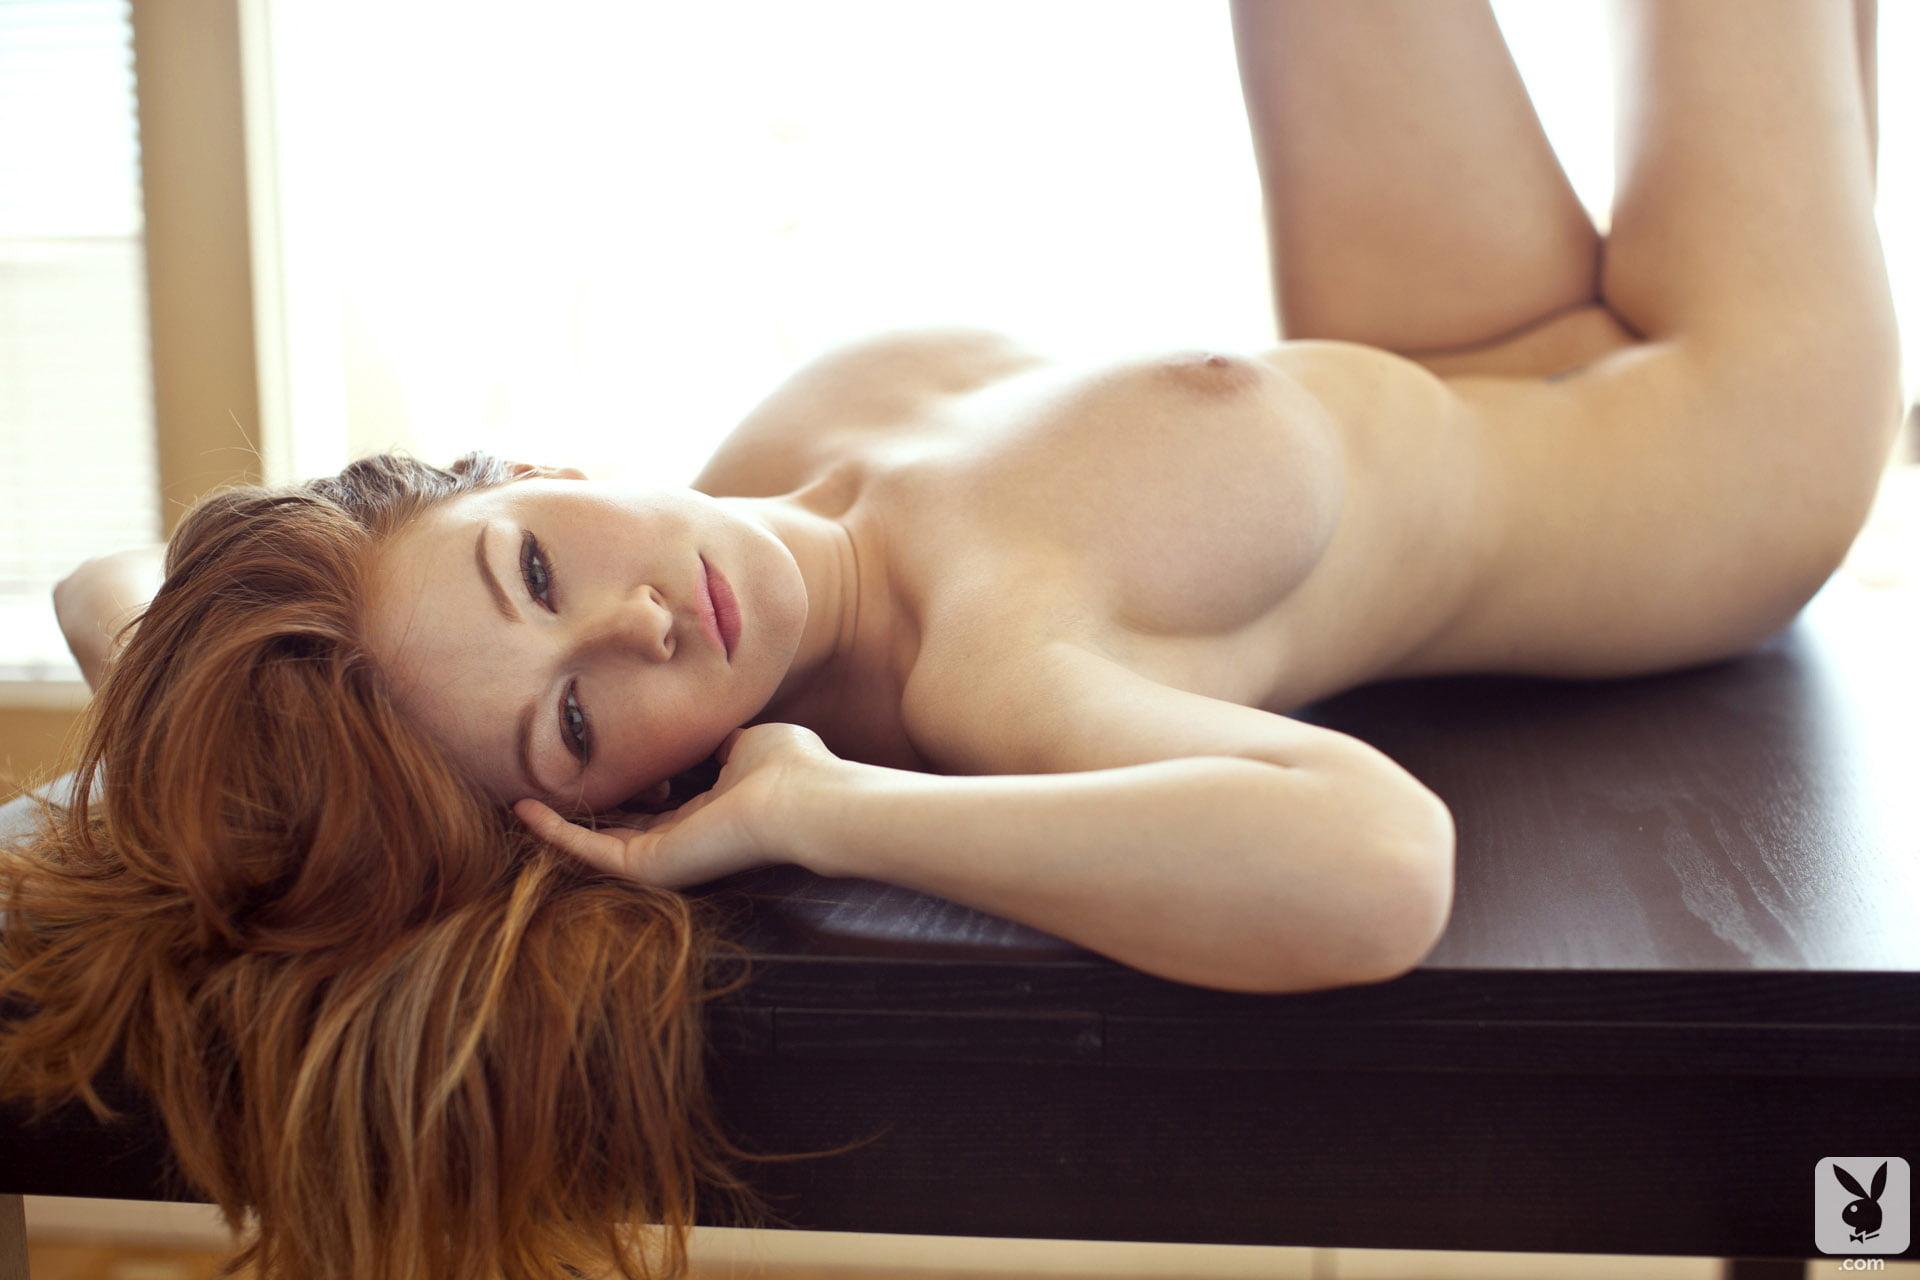 Leanna Decker Redhead Babe with Big Natural Tits